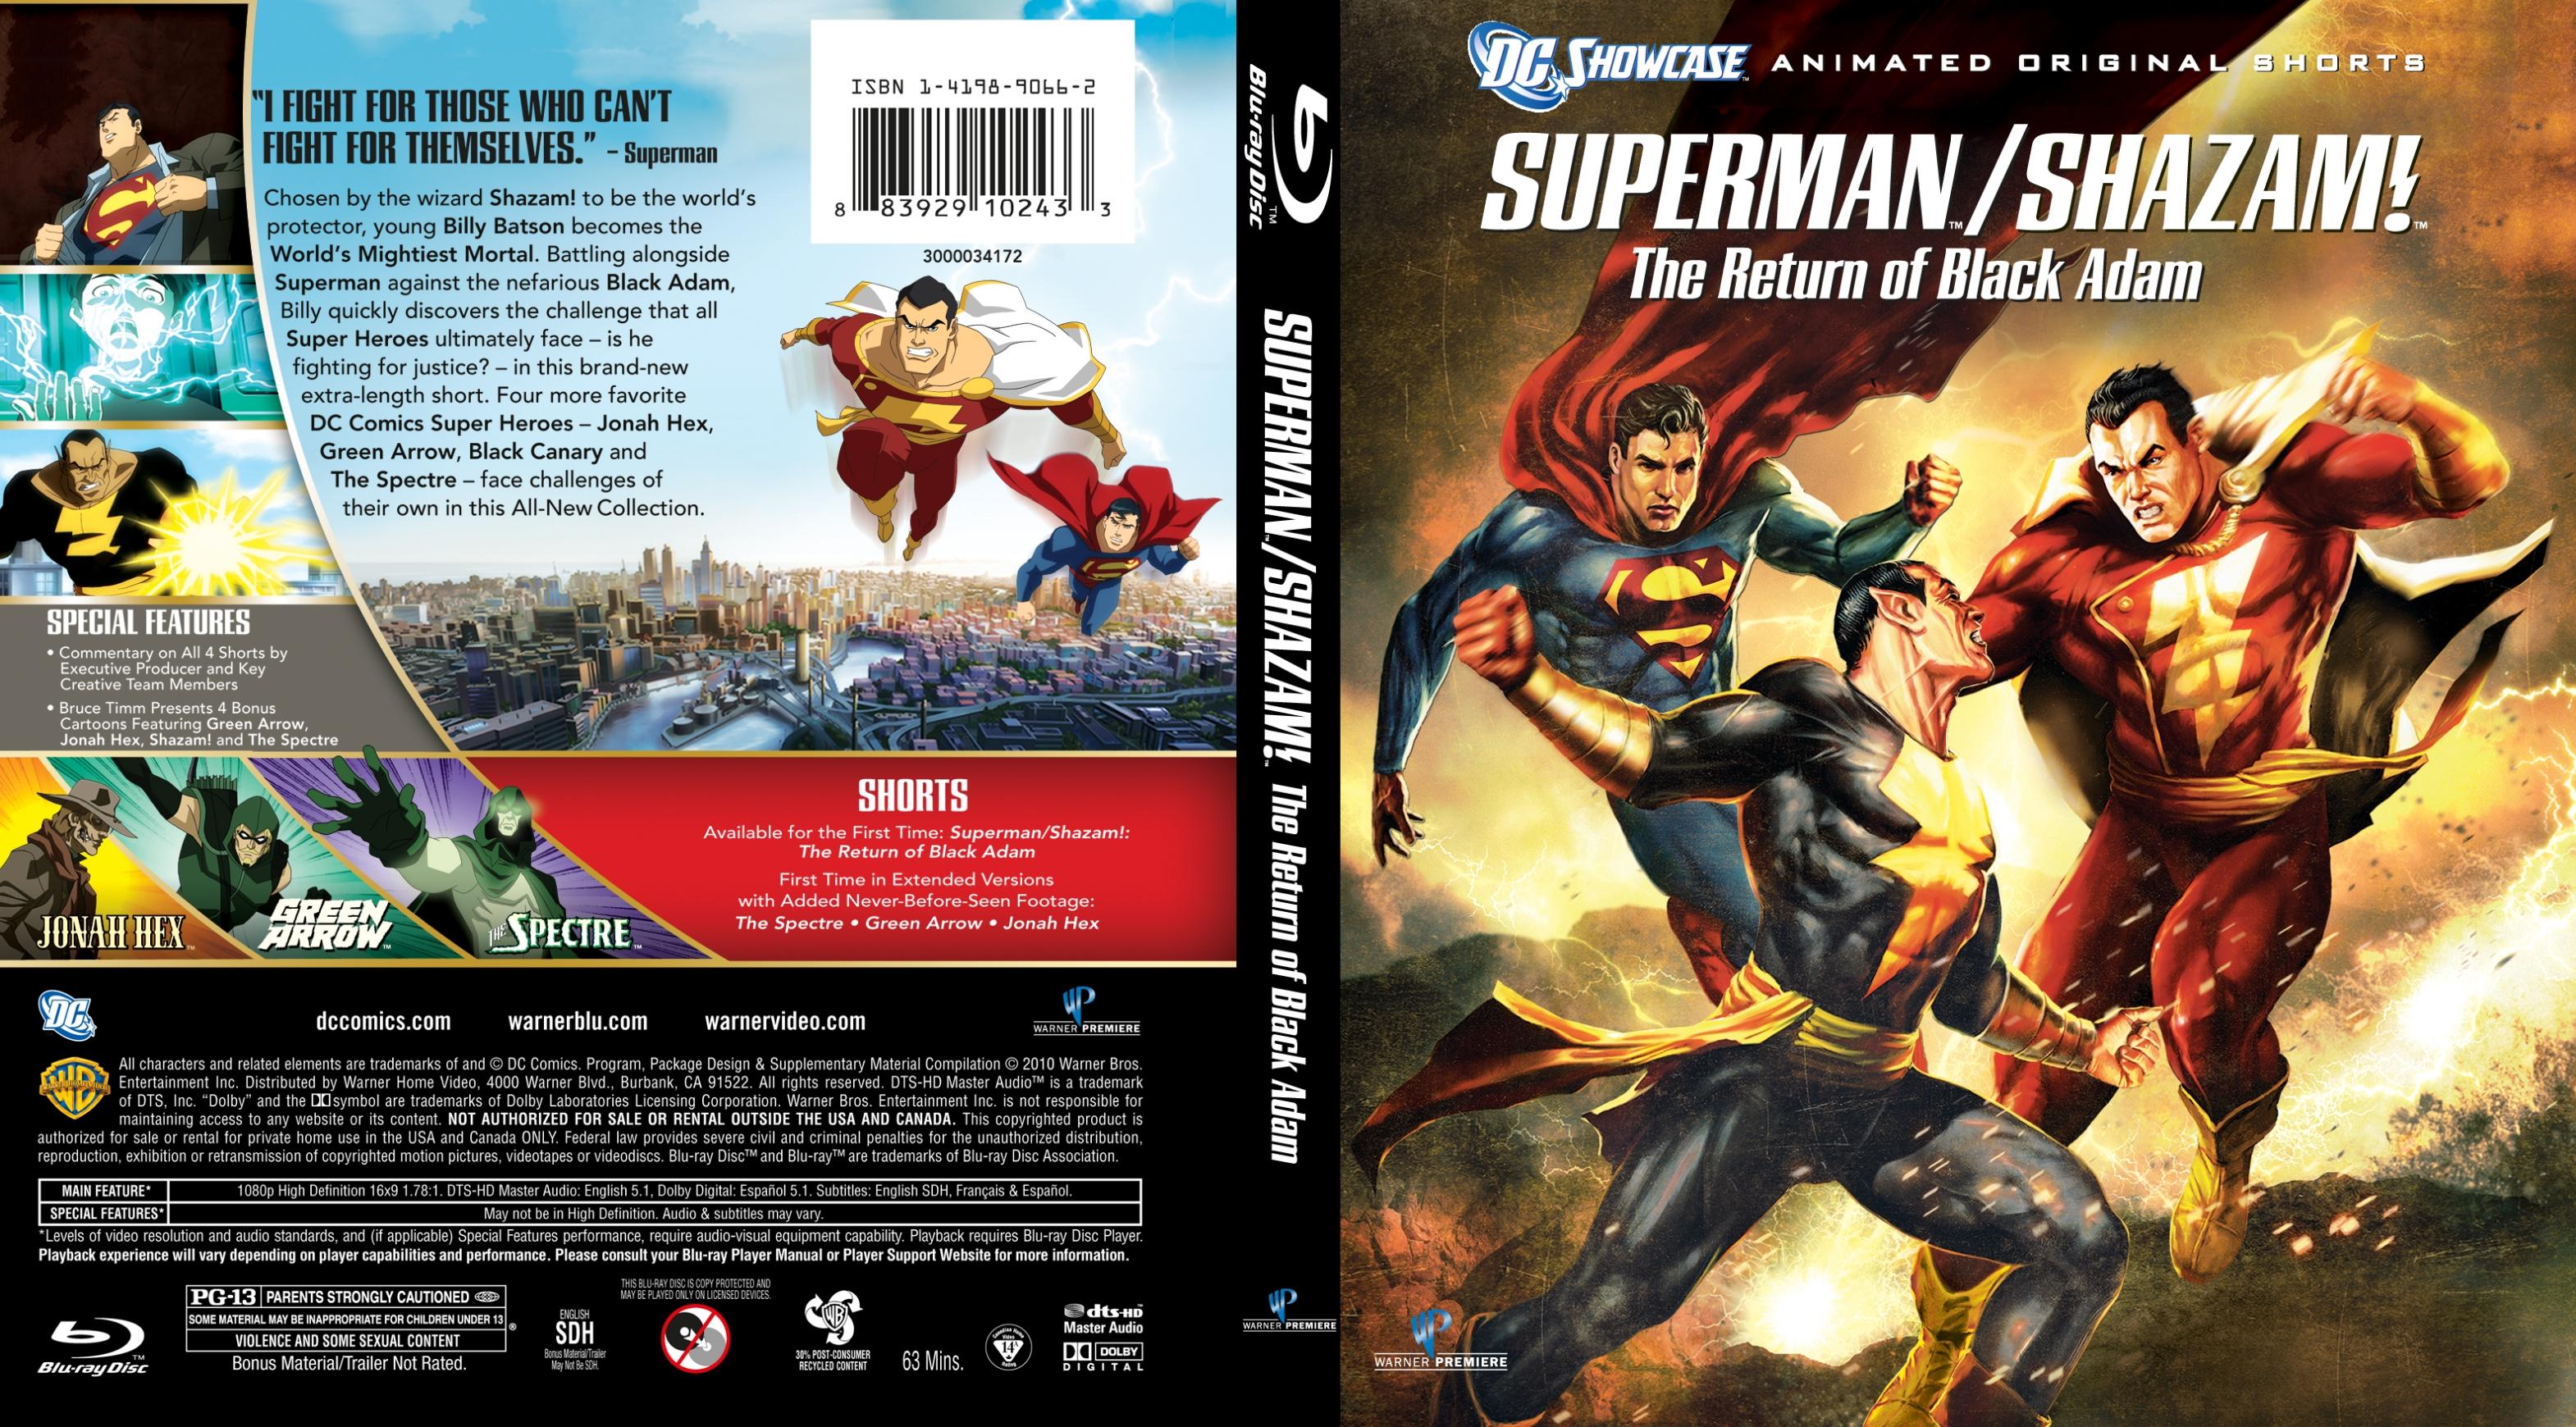 High Resolution Wallpaper | Superman Shazam!: The Return Of Black Adam 3140x1740 px